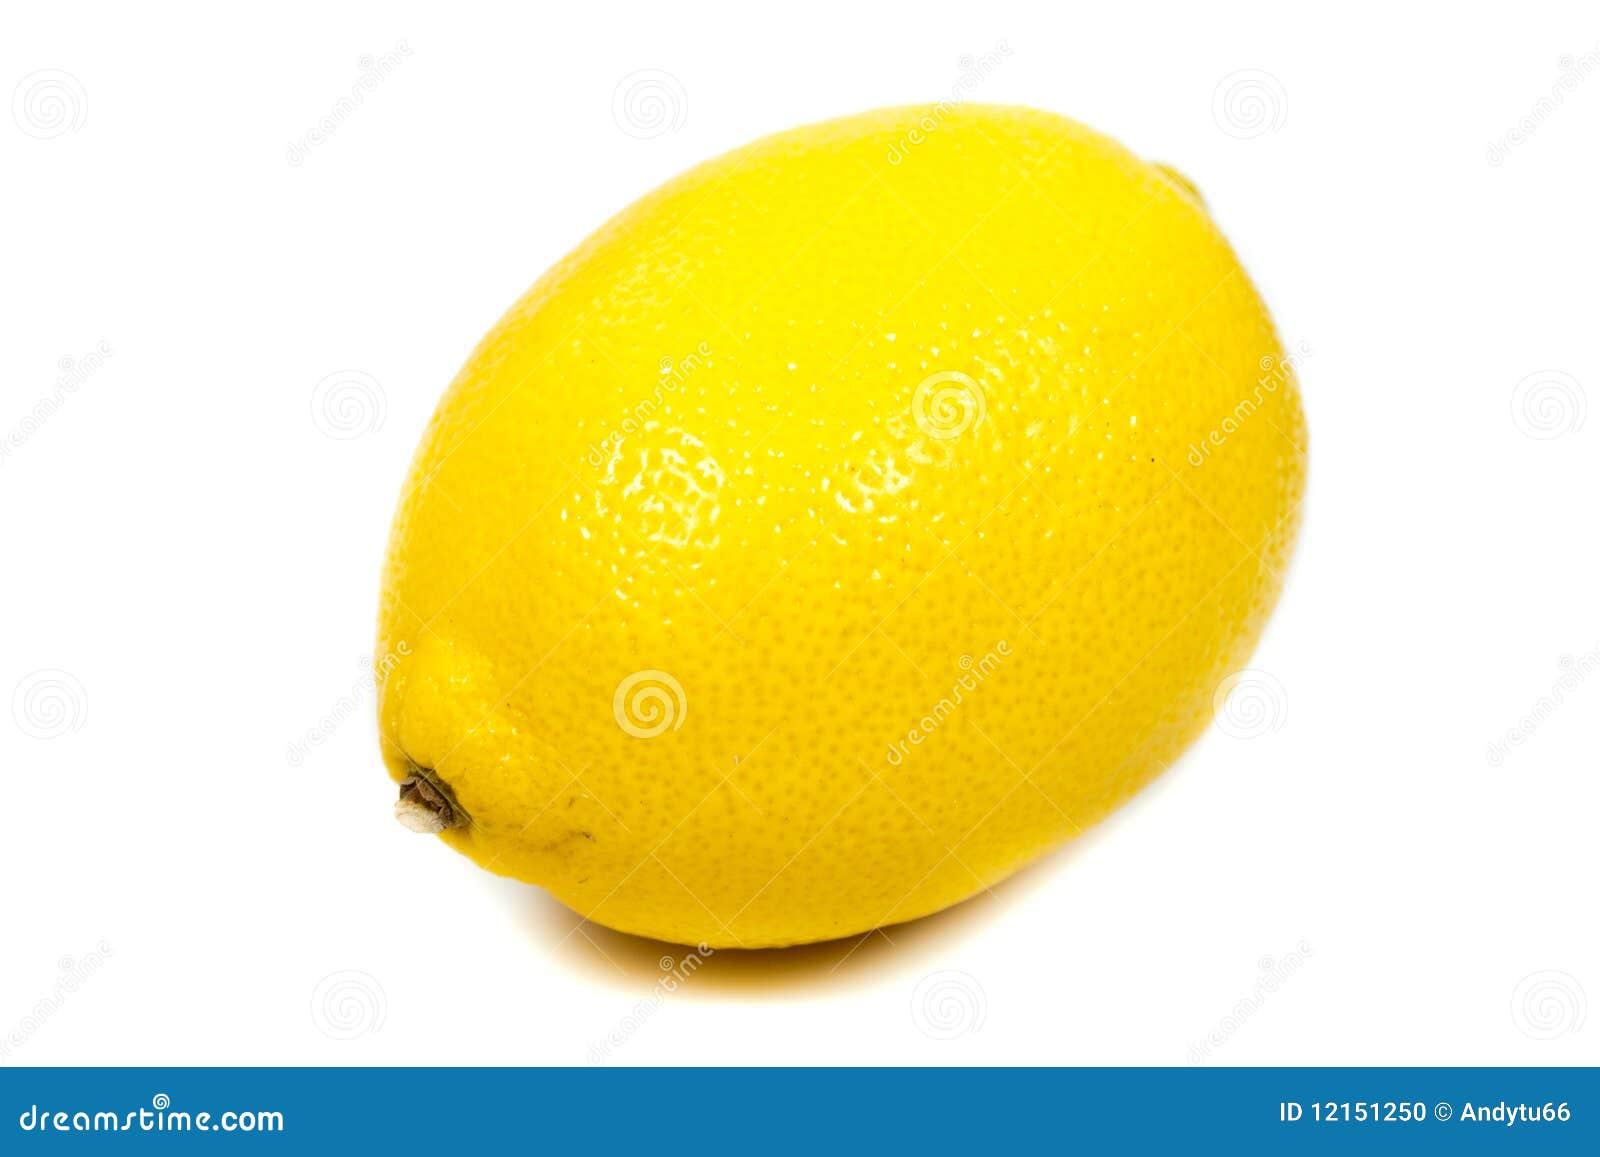 Close Up Bright Yellow Lemon Stock Photo Image 12151250